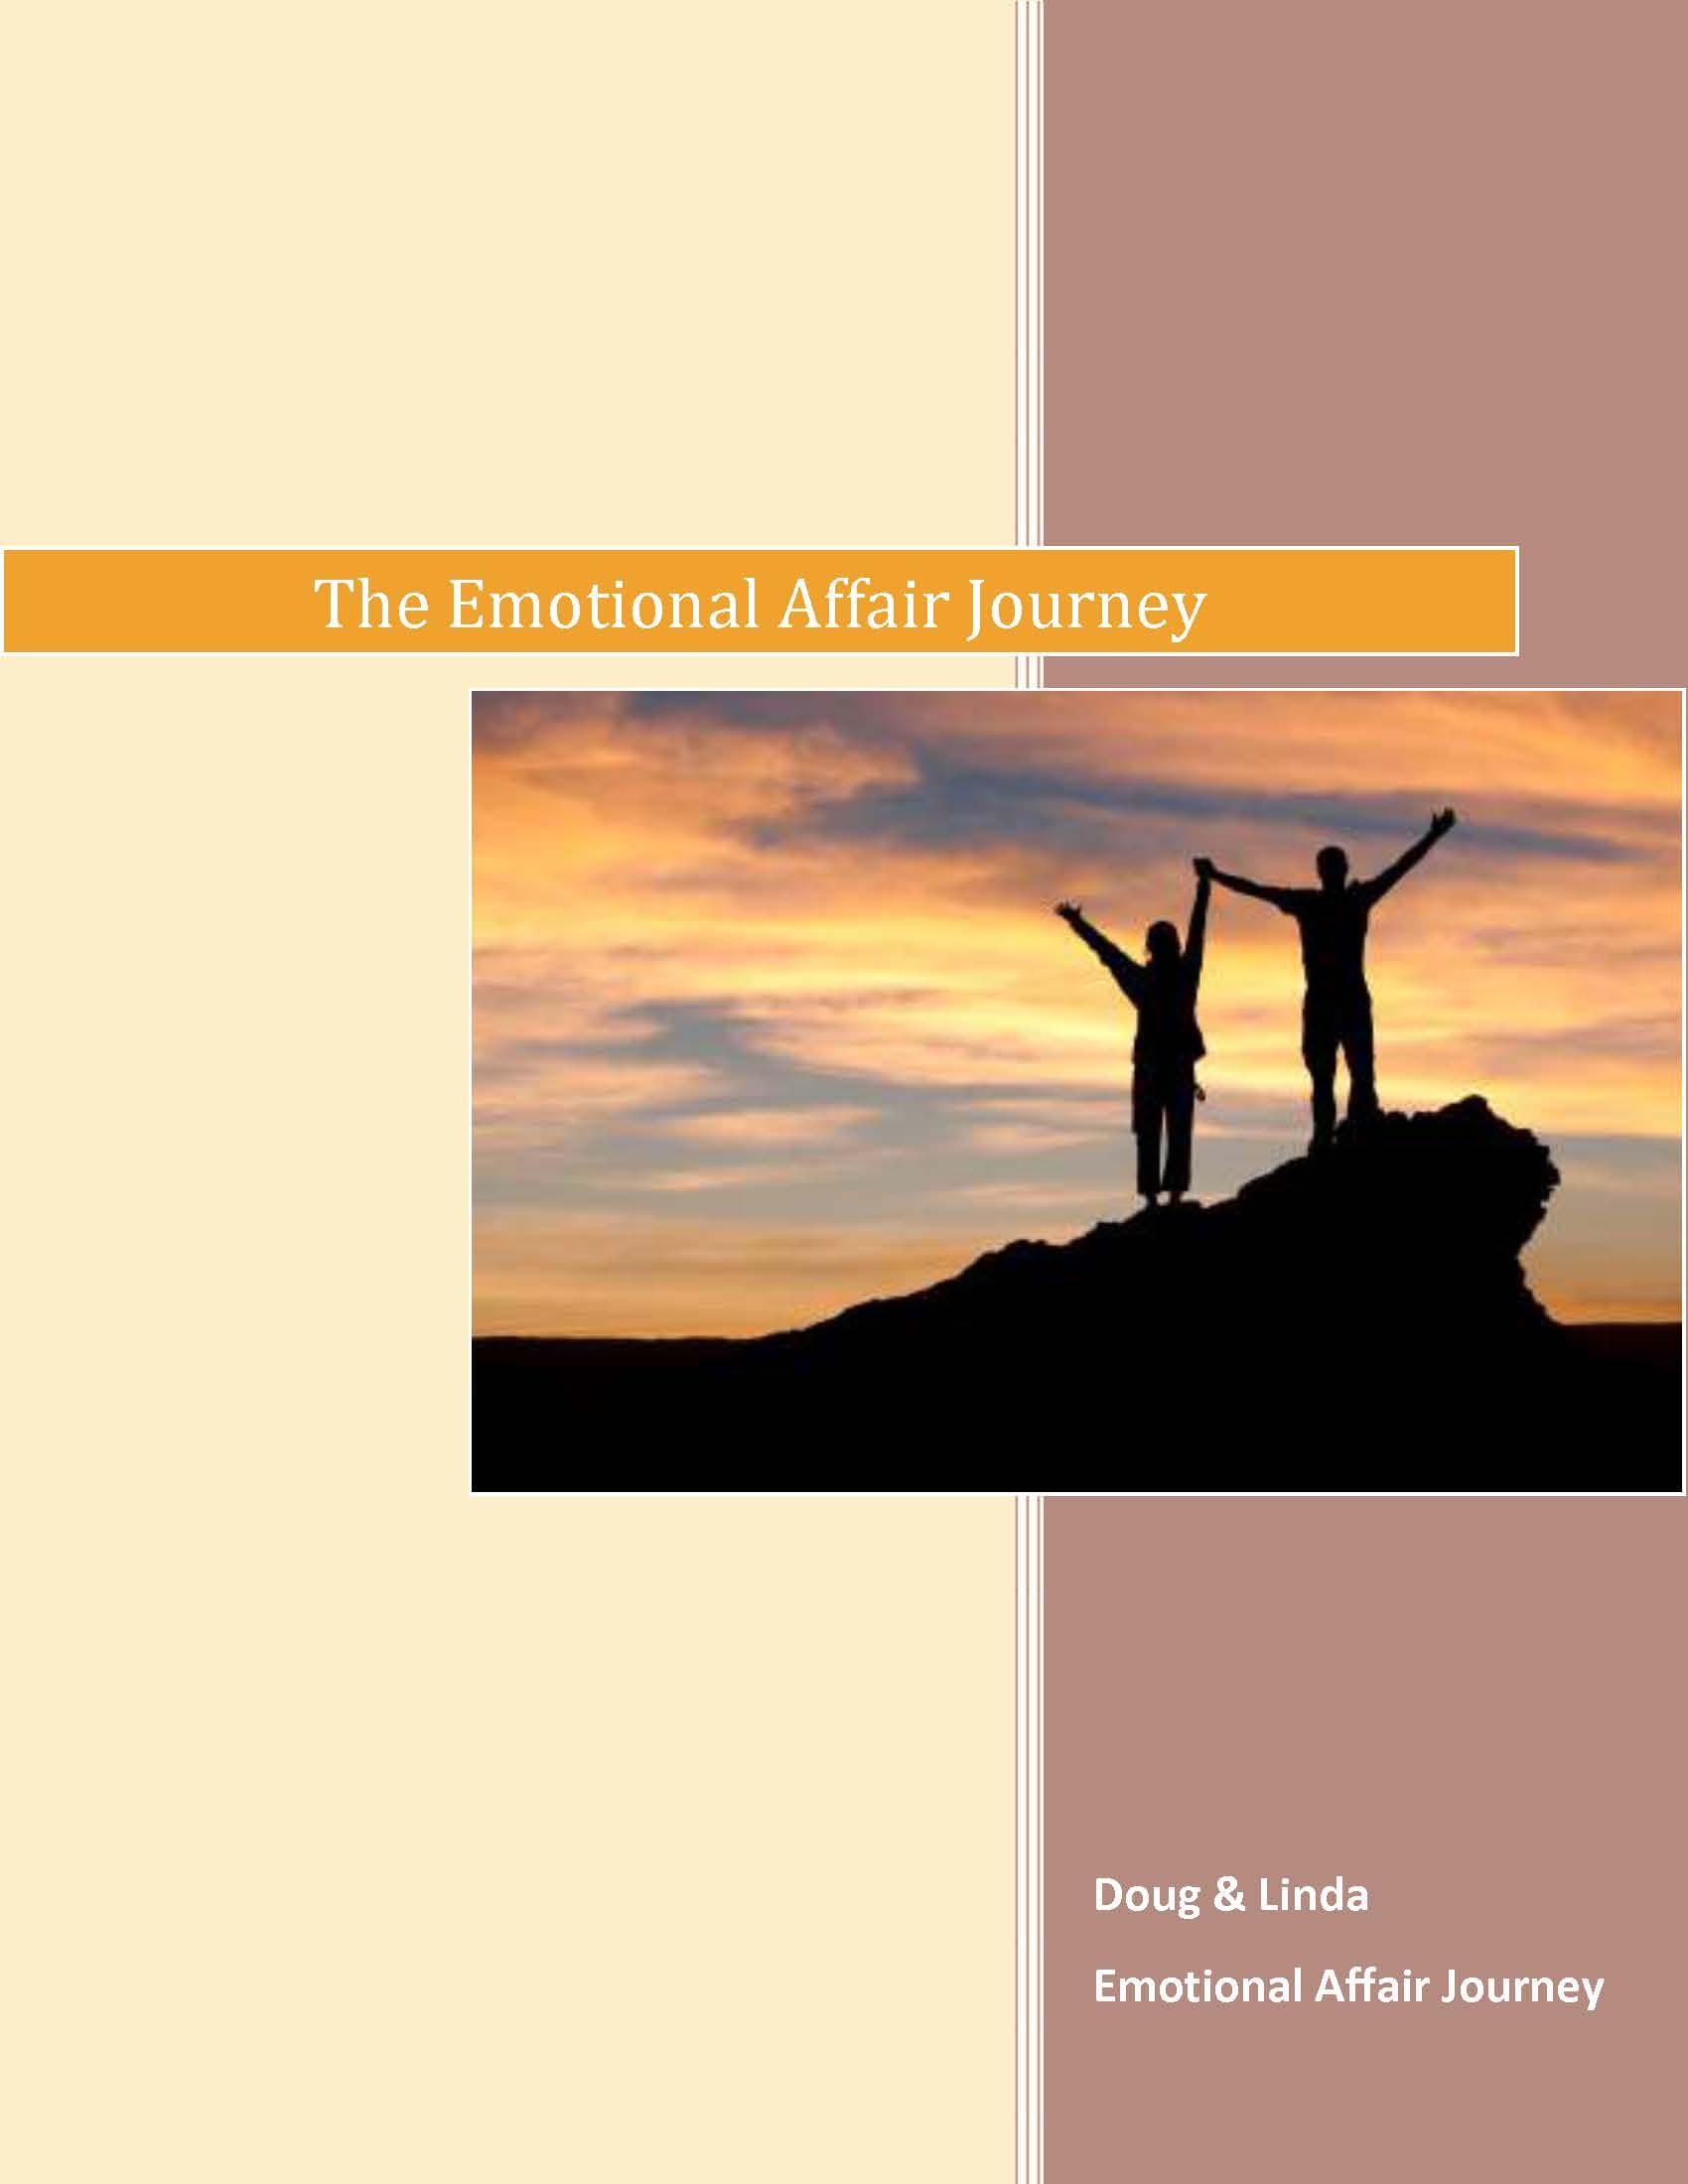 Emotional affair journey blog